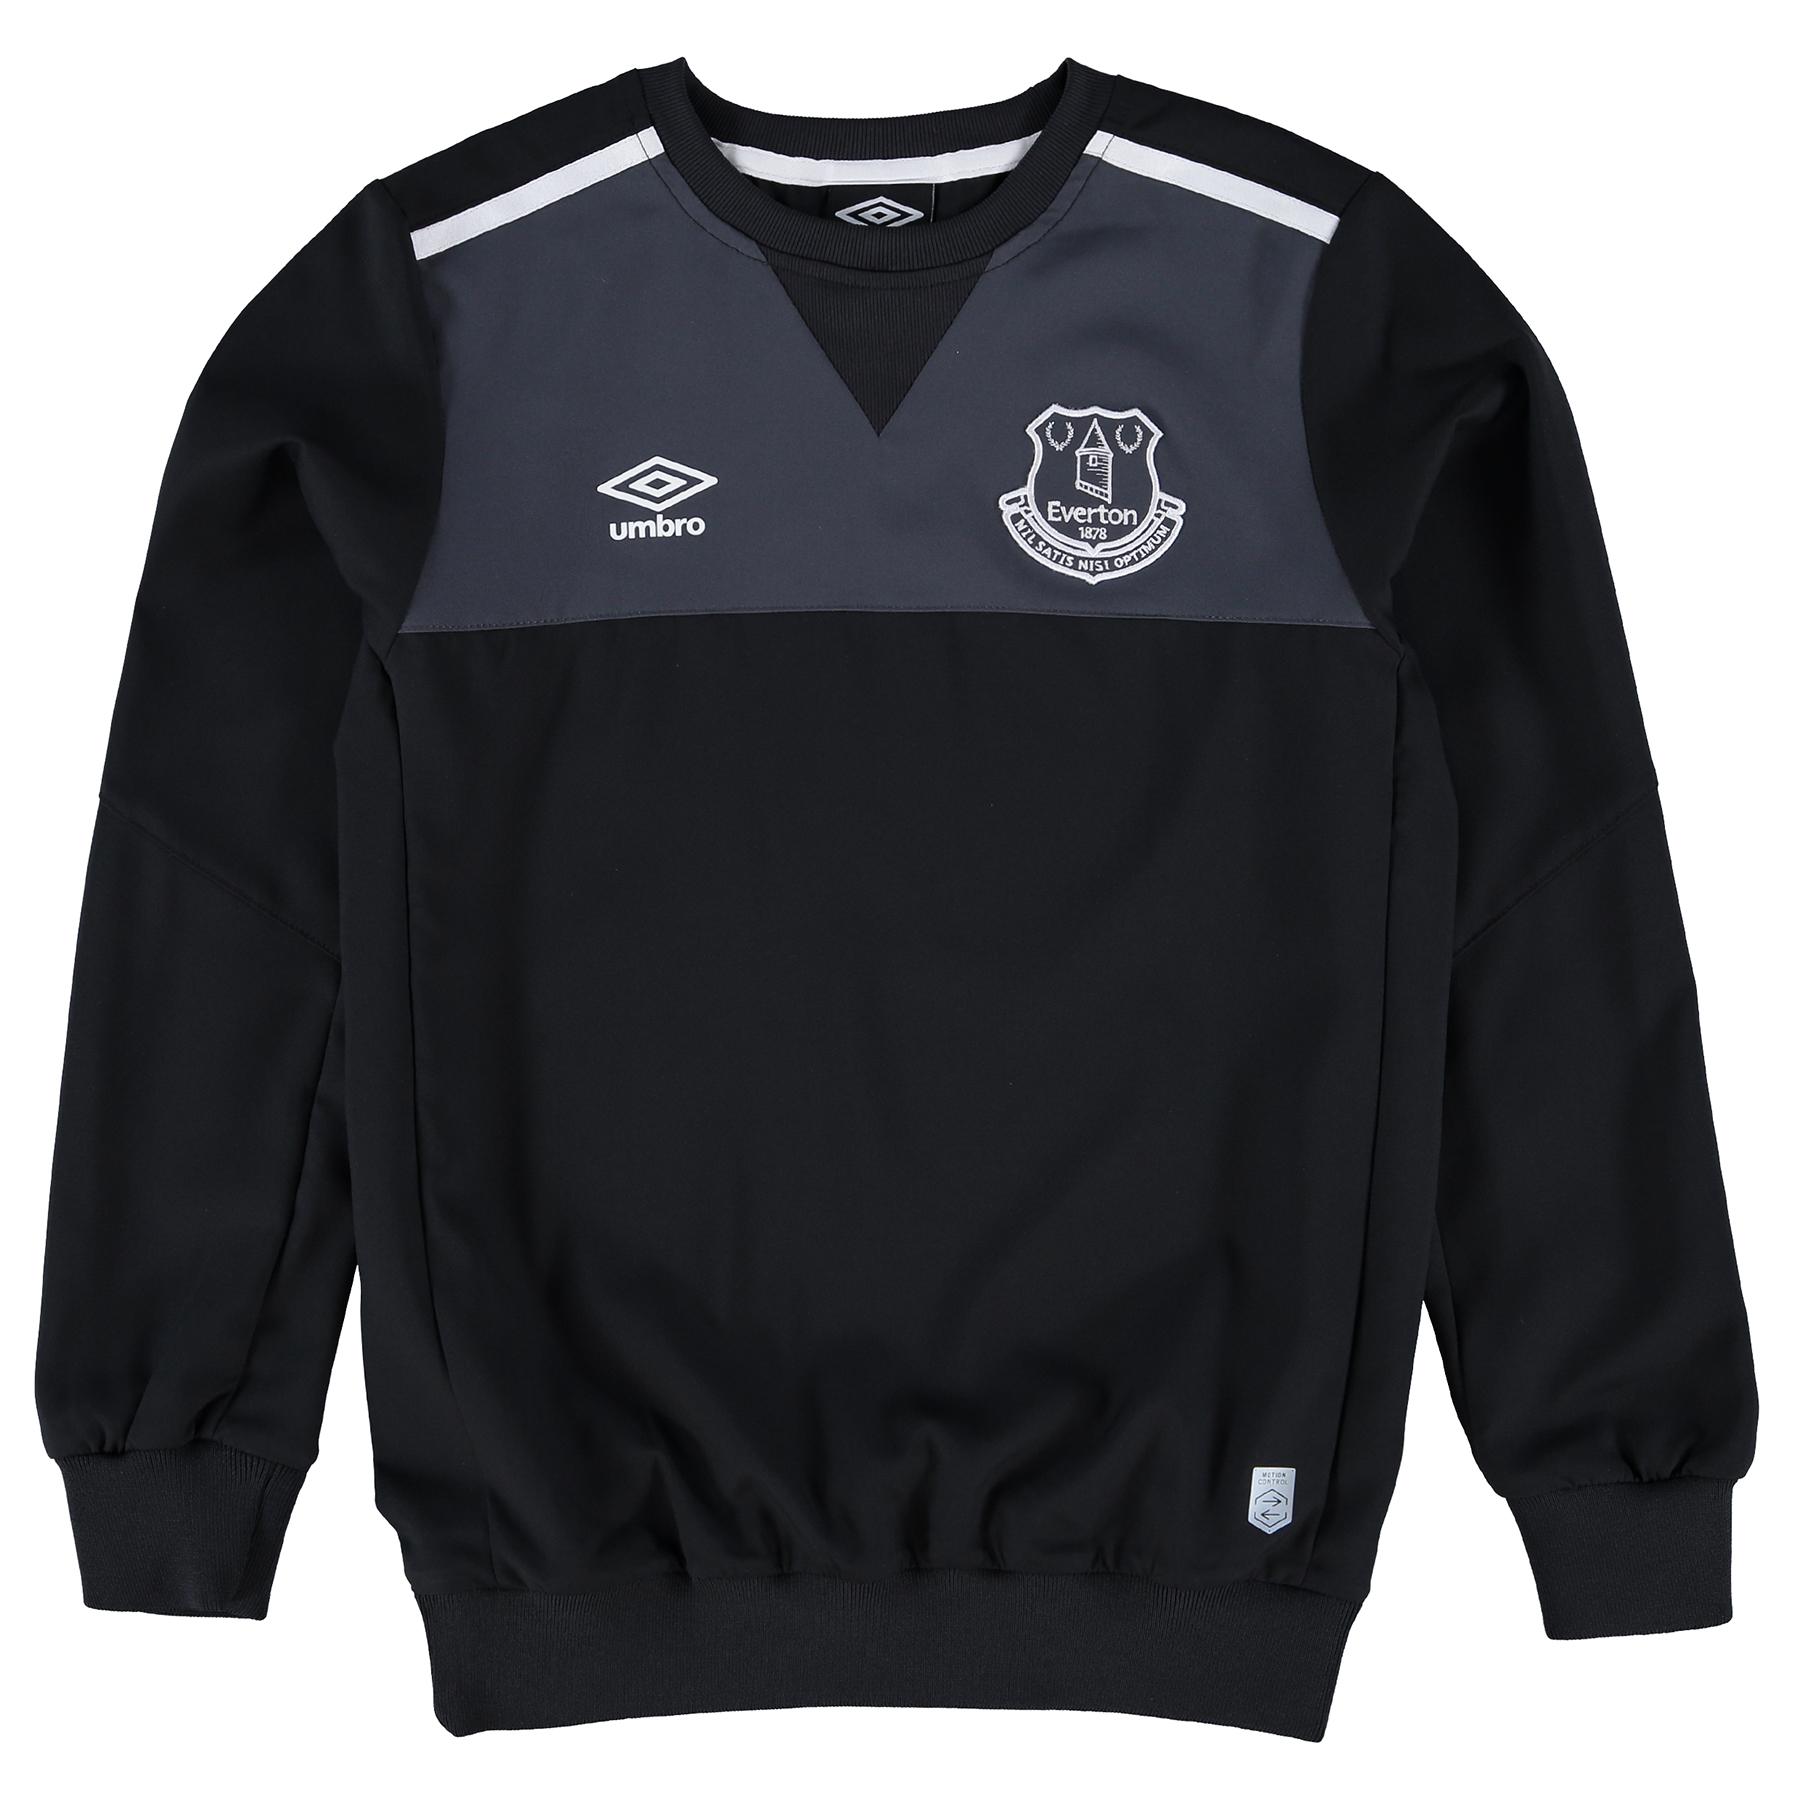 Everton Training Drill Top - Junior - Black/Carbon/White